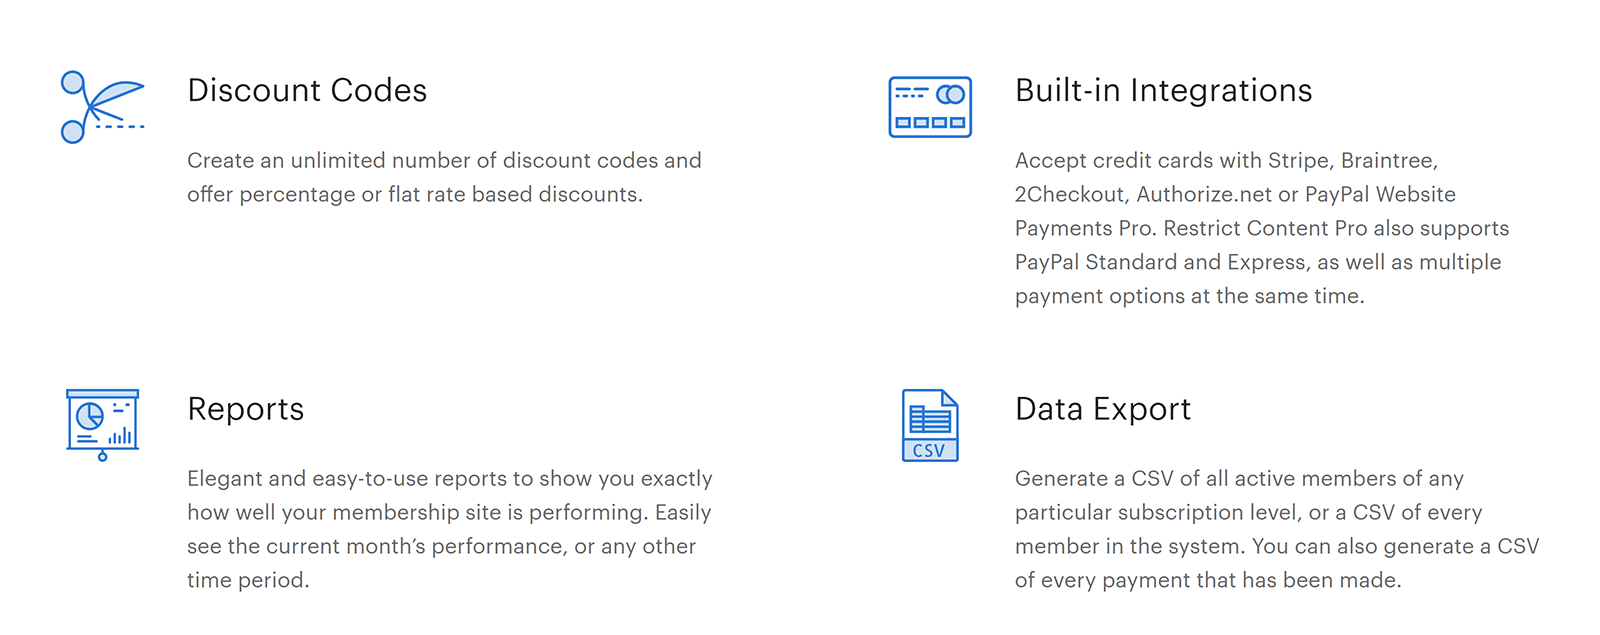 Limite la funcionalidad de Content Pro